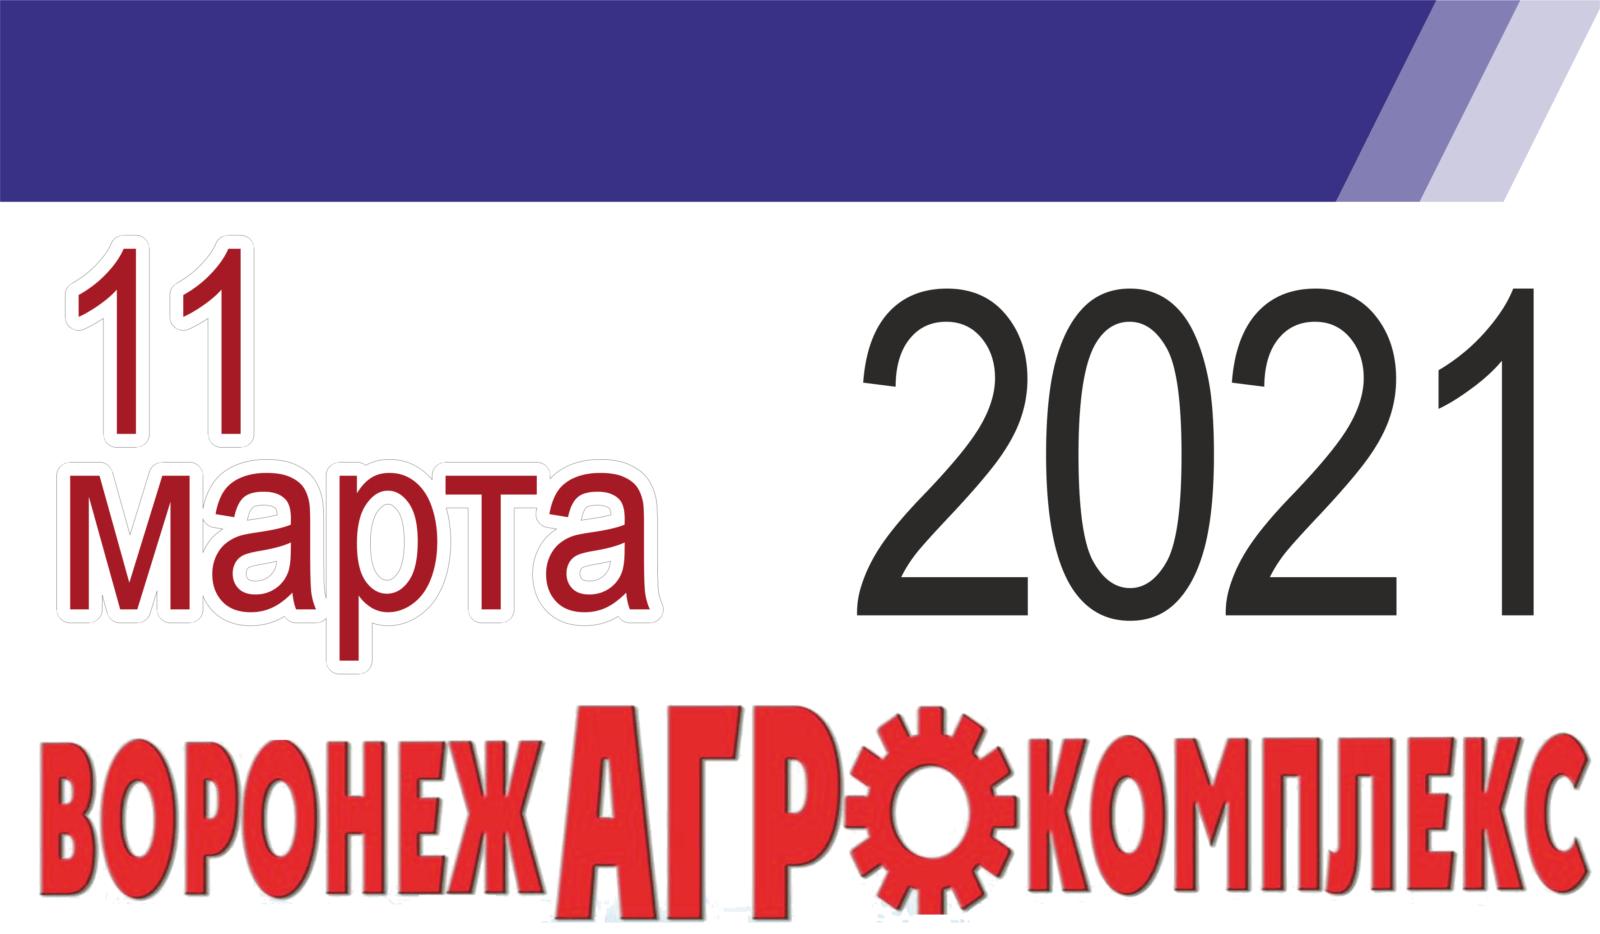 voronezhagrokompleks - Воронежагрокомплекс-2021